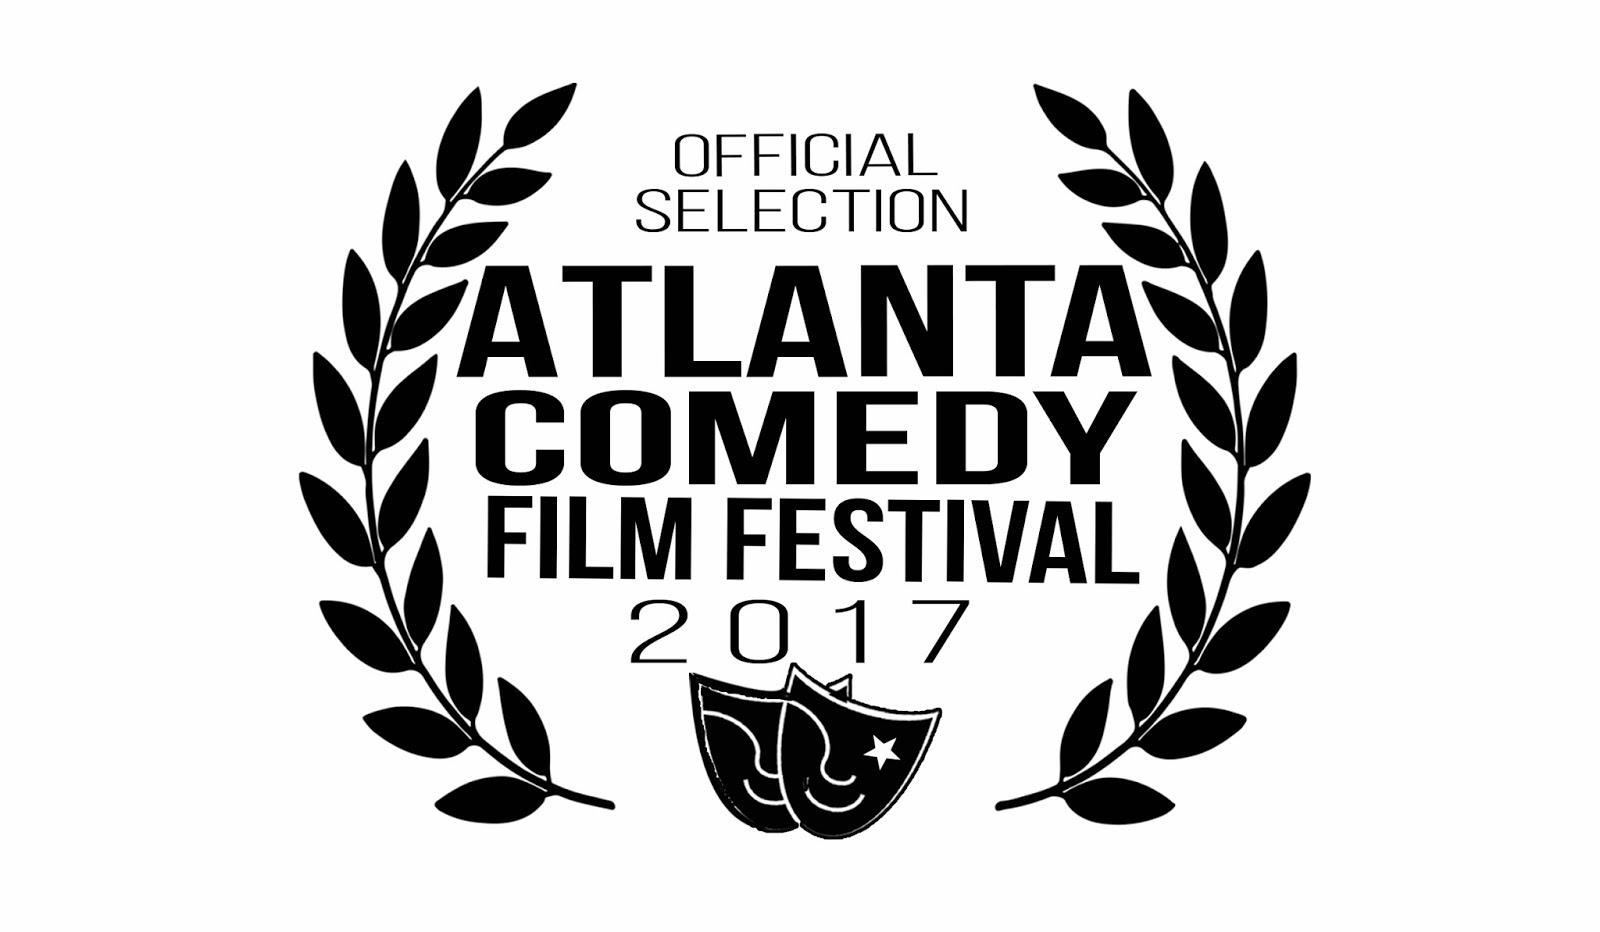 Atlanta Comedy Film Festival Summer 2017 Award Winners